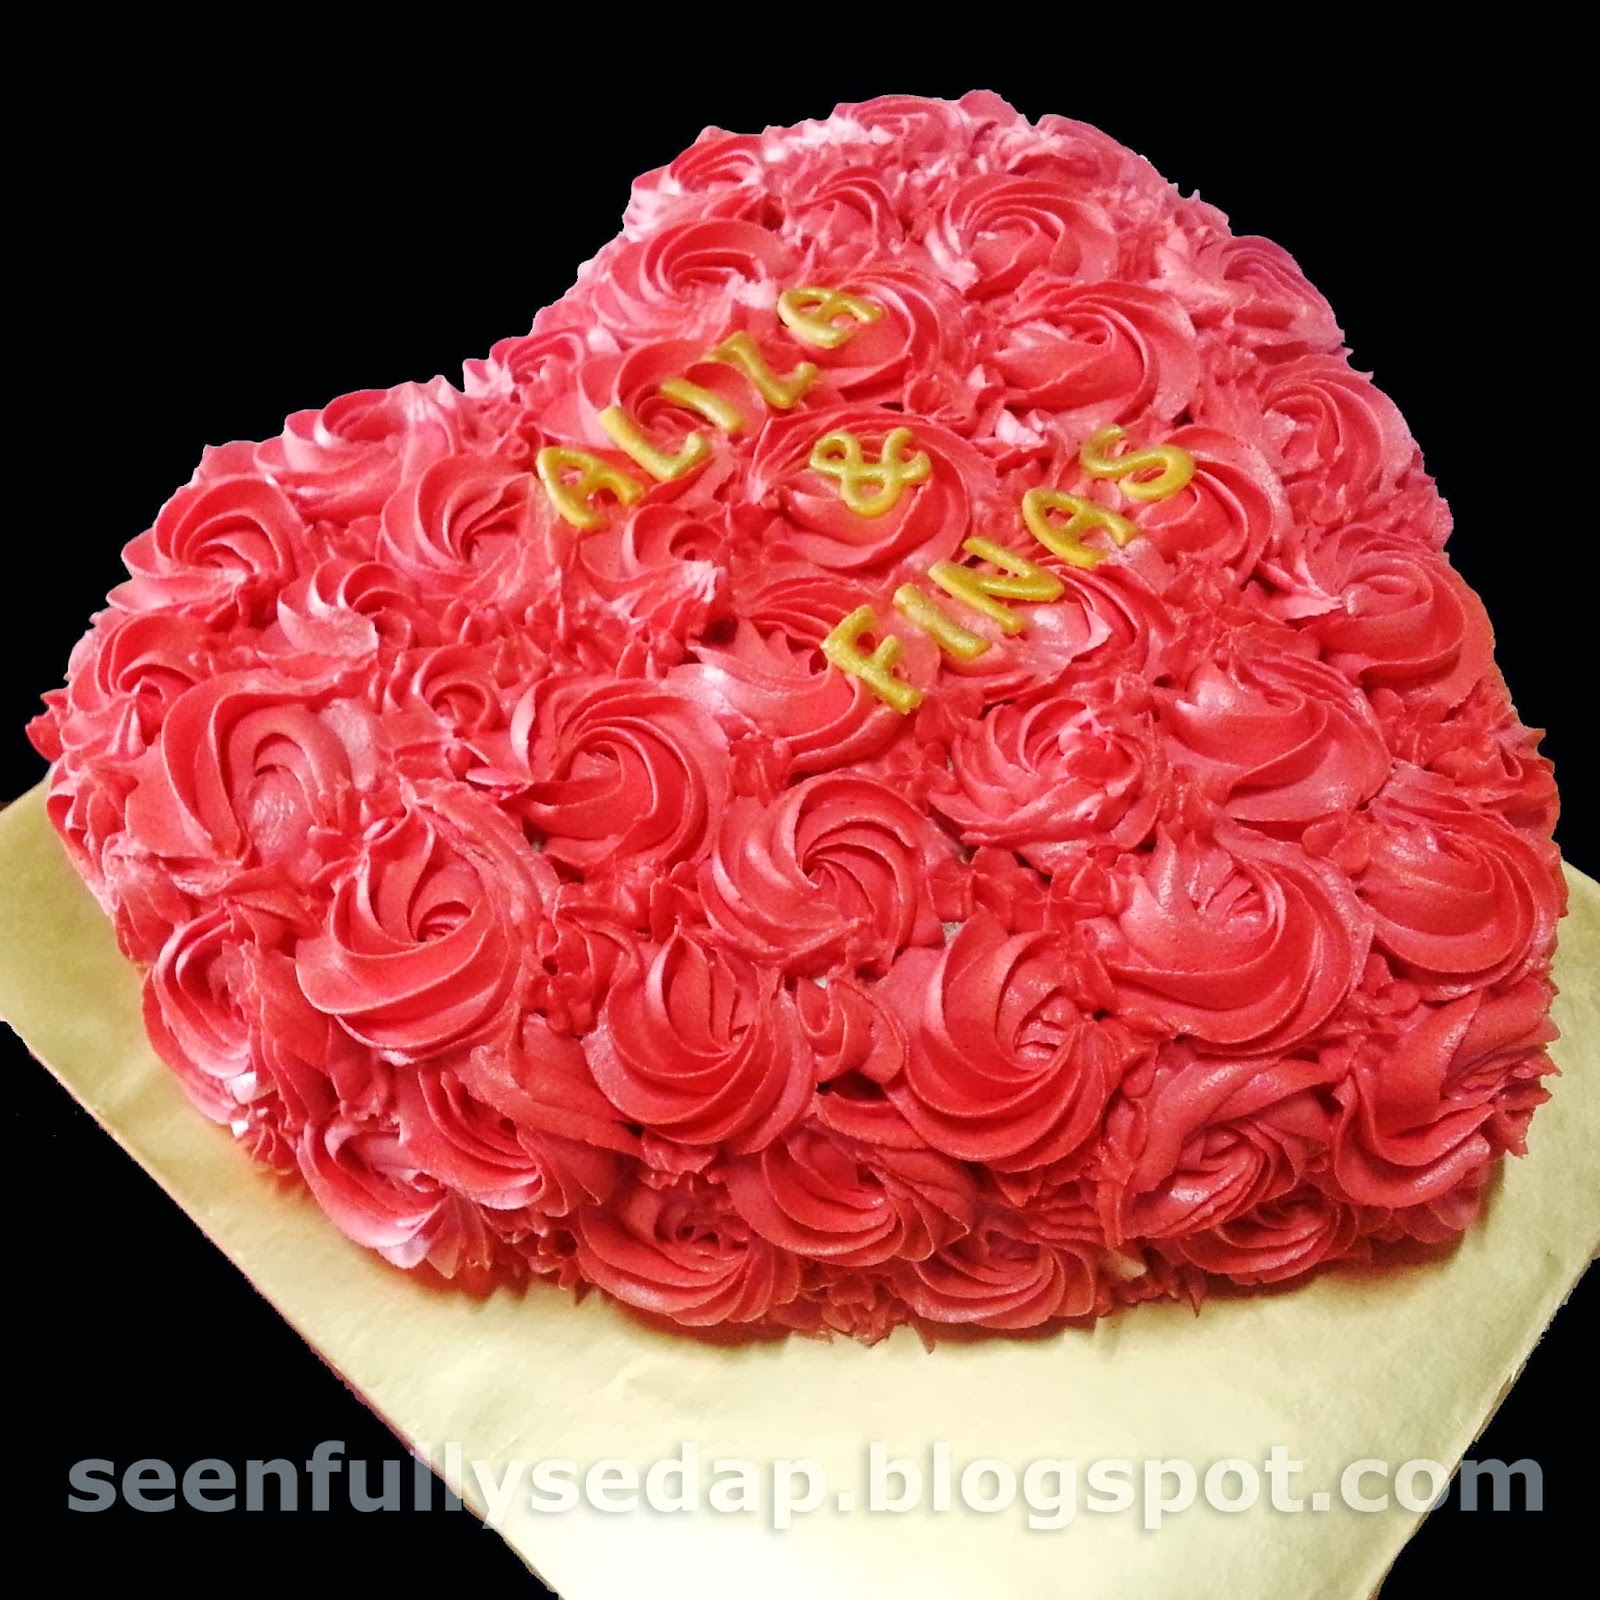 Seenfully sedap loved shaped cake loved shaped cake birthday izmirmasajfo